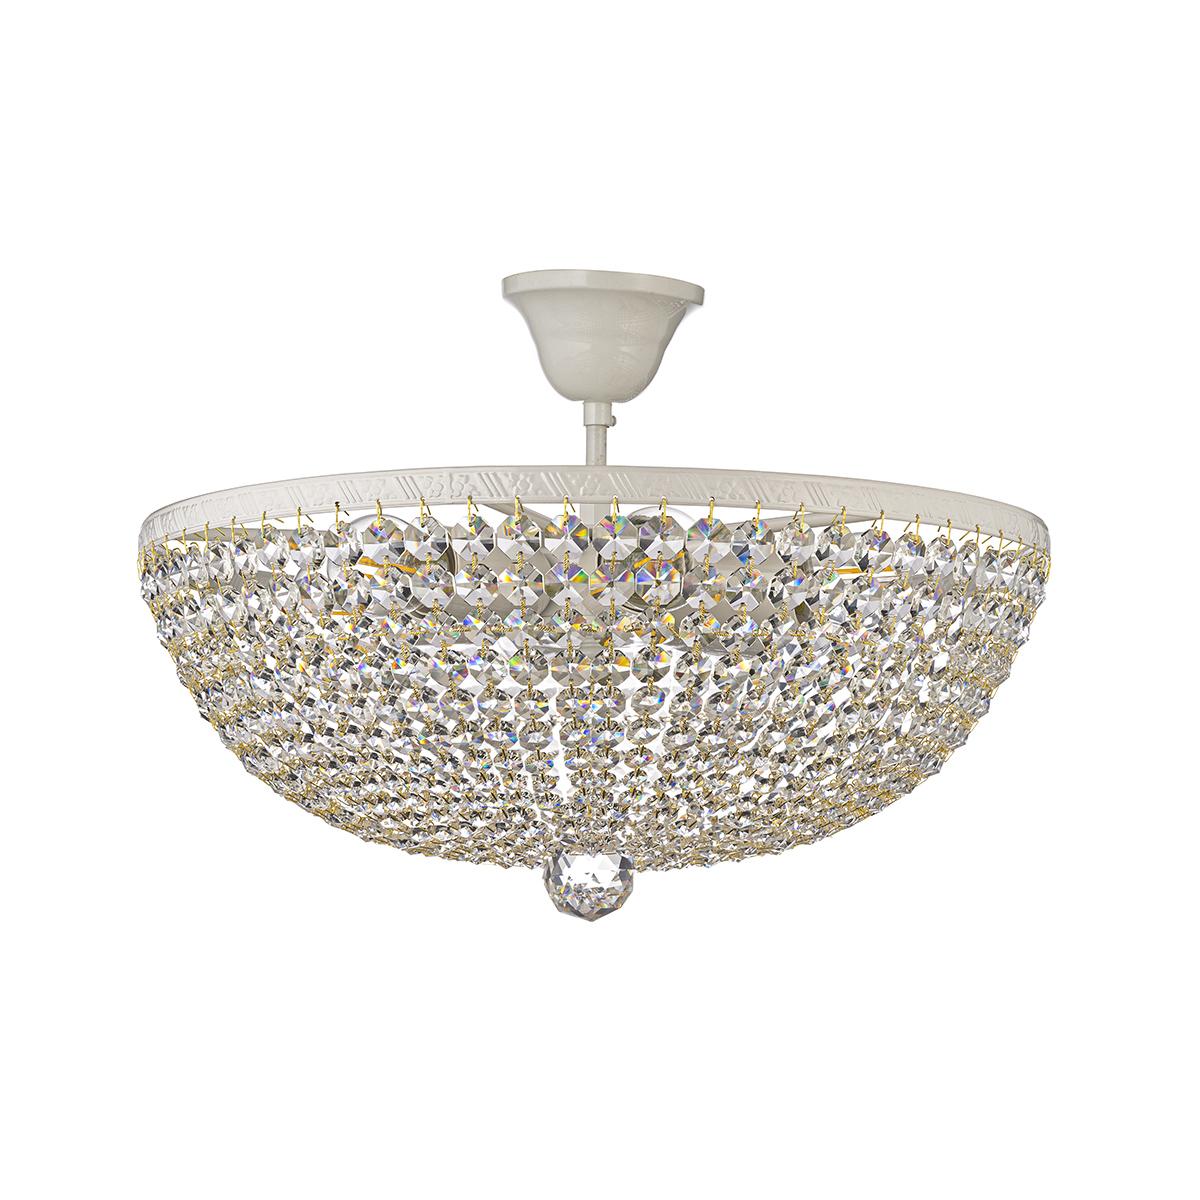 Потолочный светильник Arti Lampadari Nobile E 1.3.40.100 WG